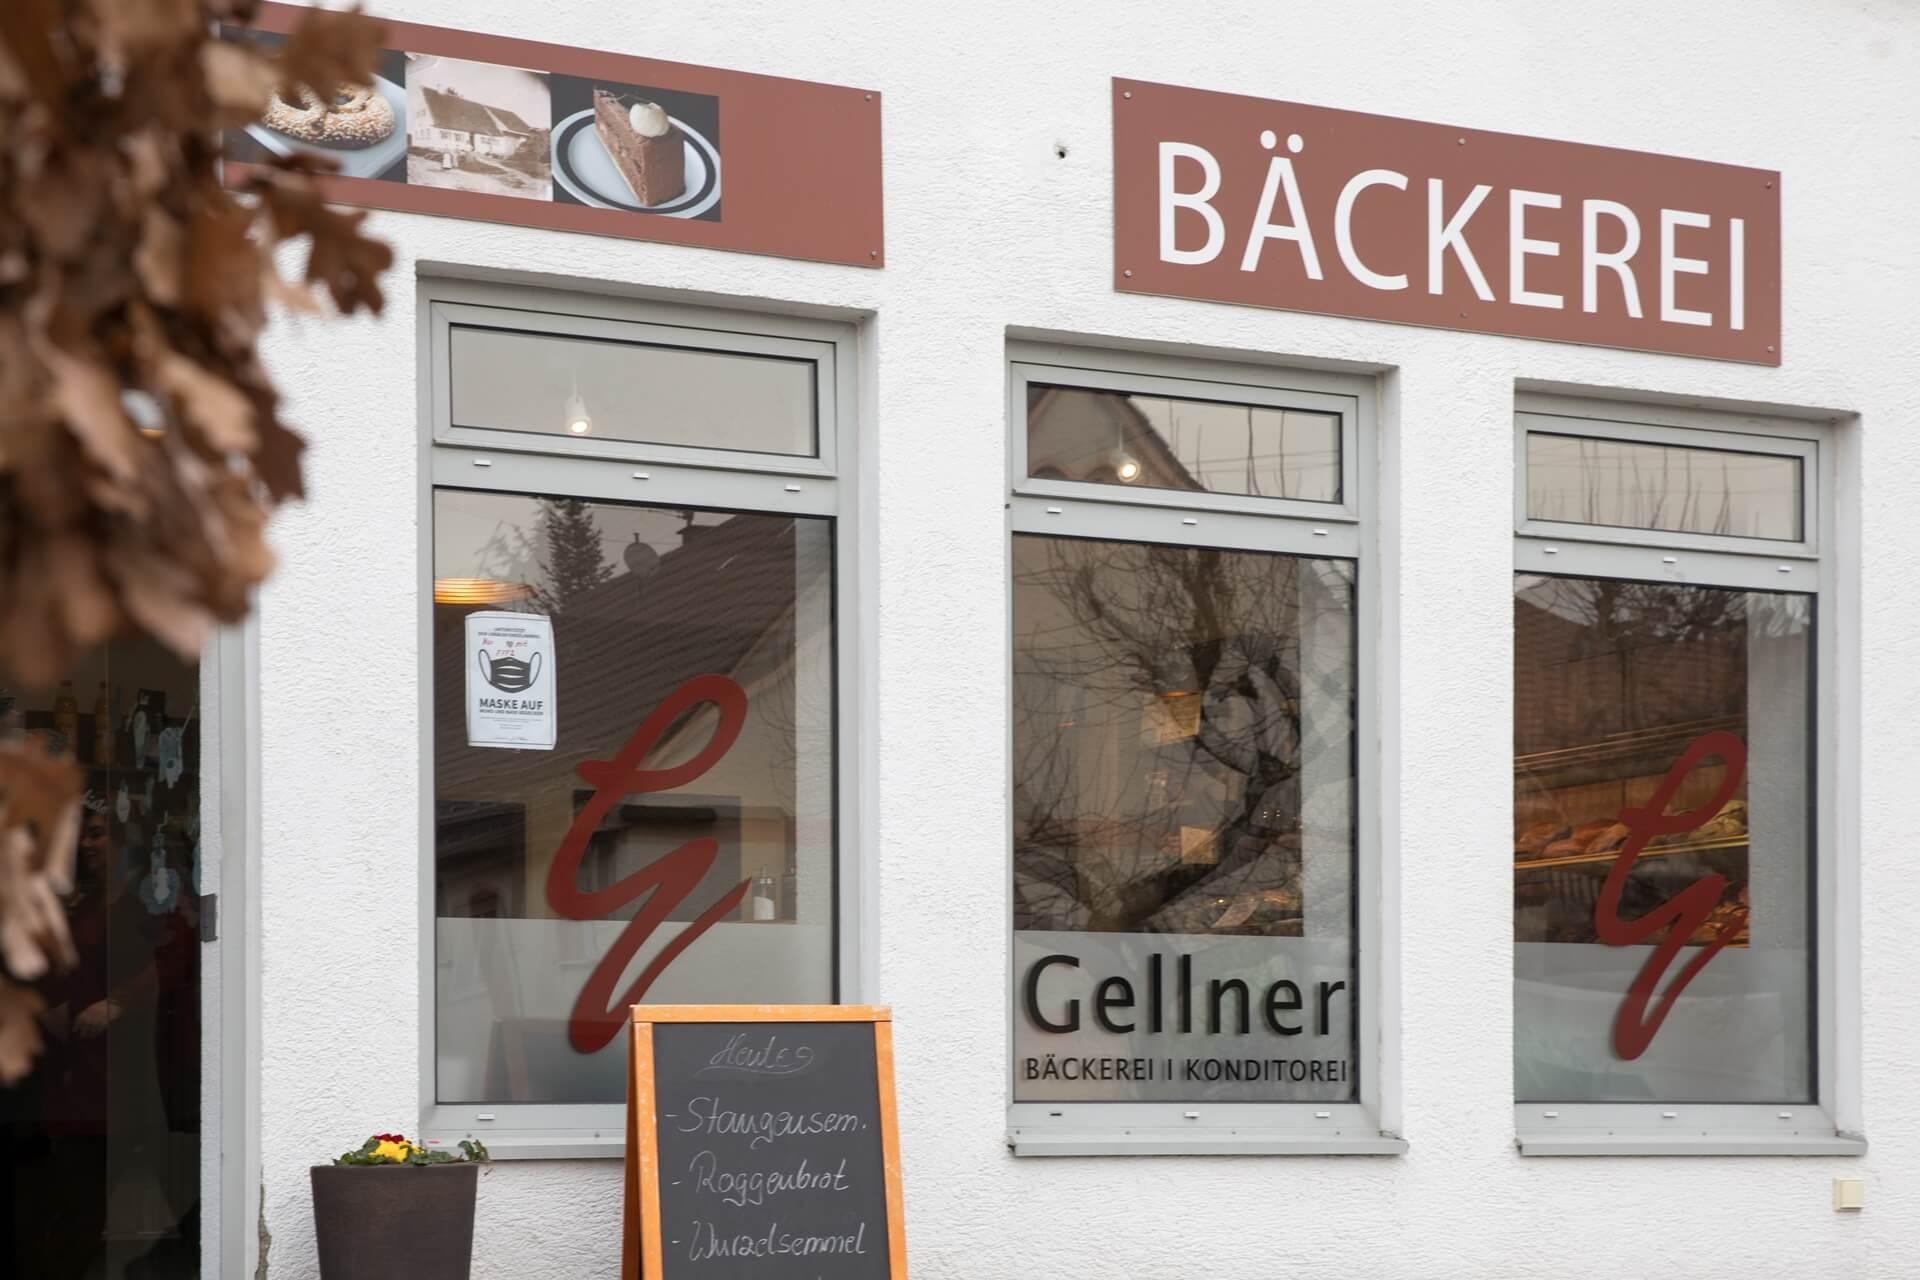 Bäckerei_Gellner_0322 Biburg